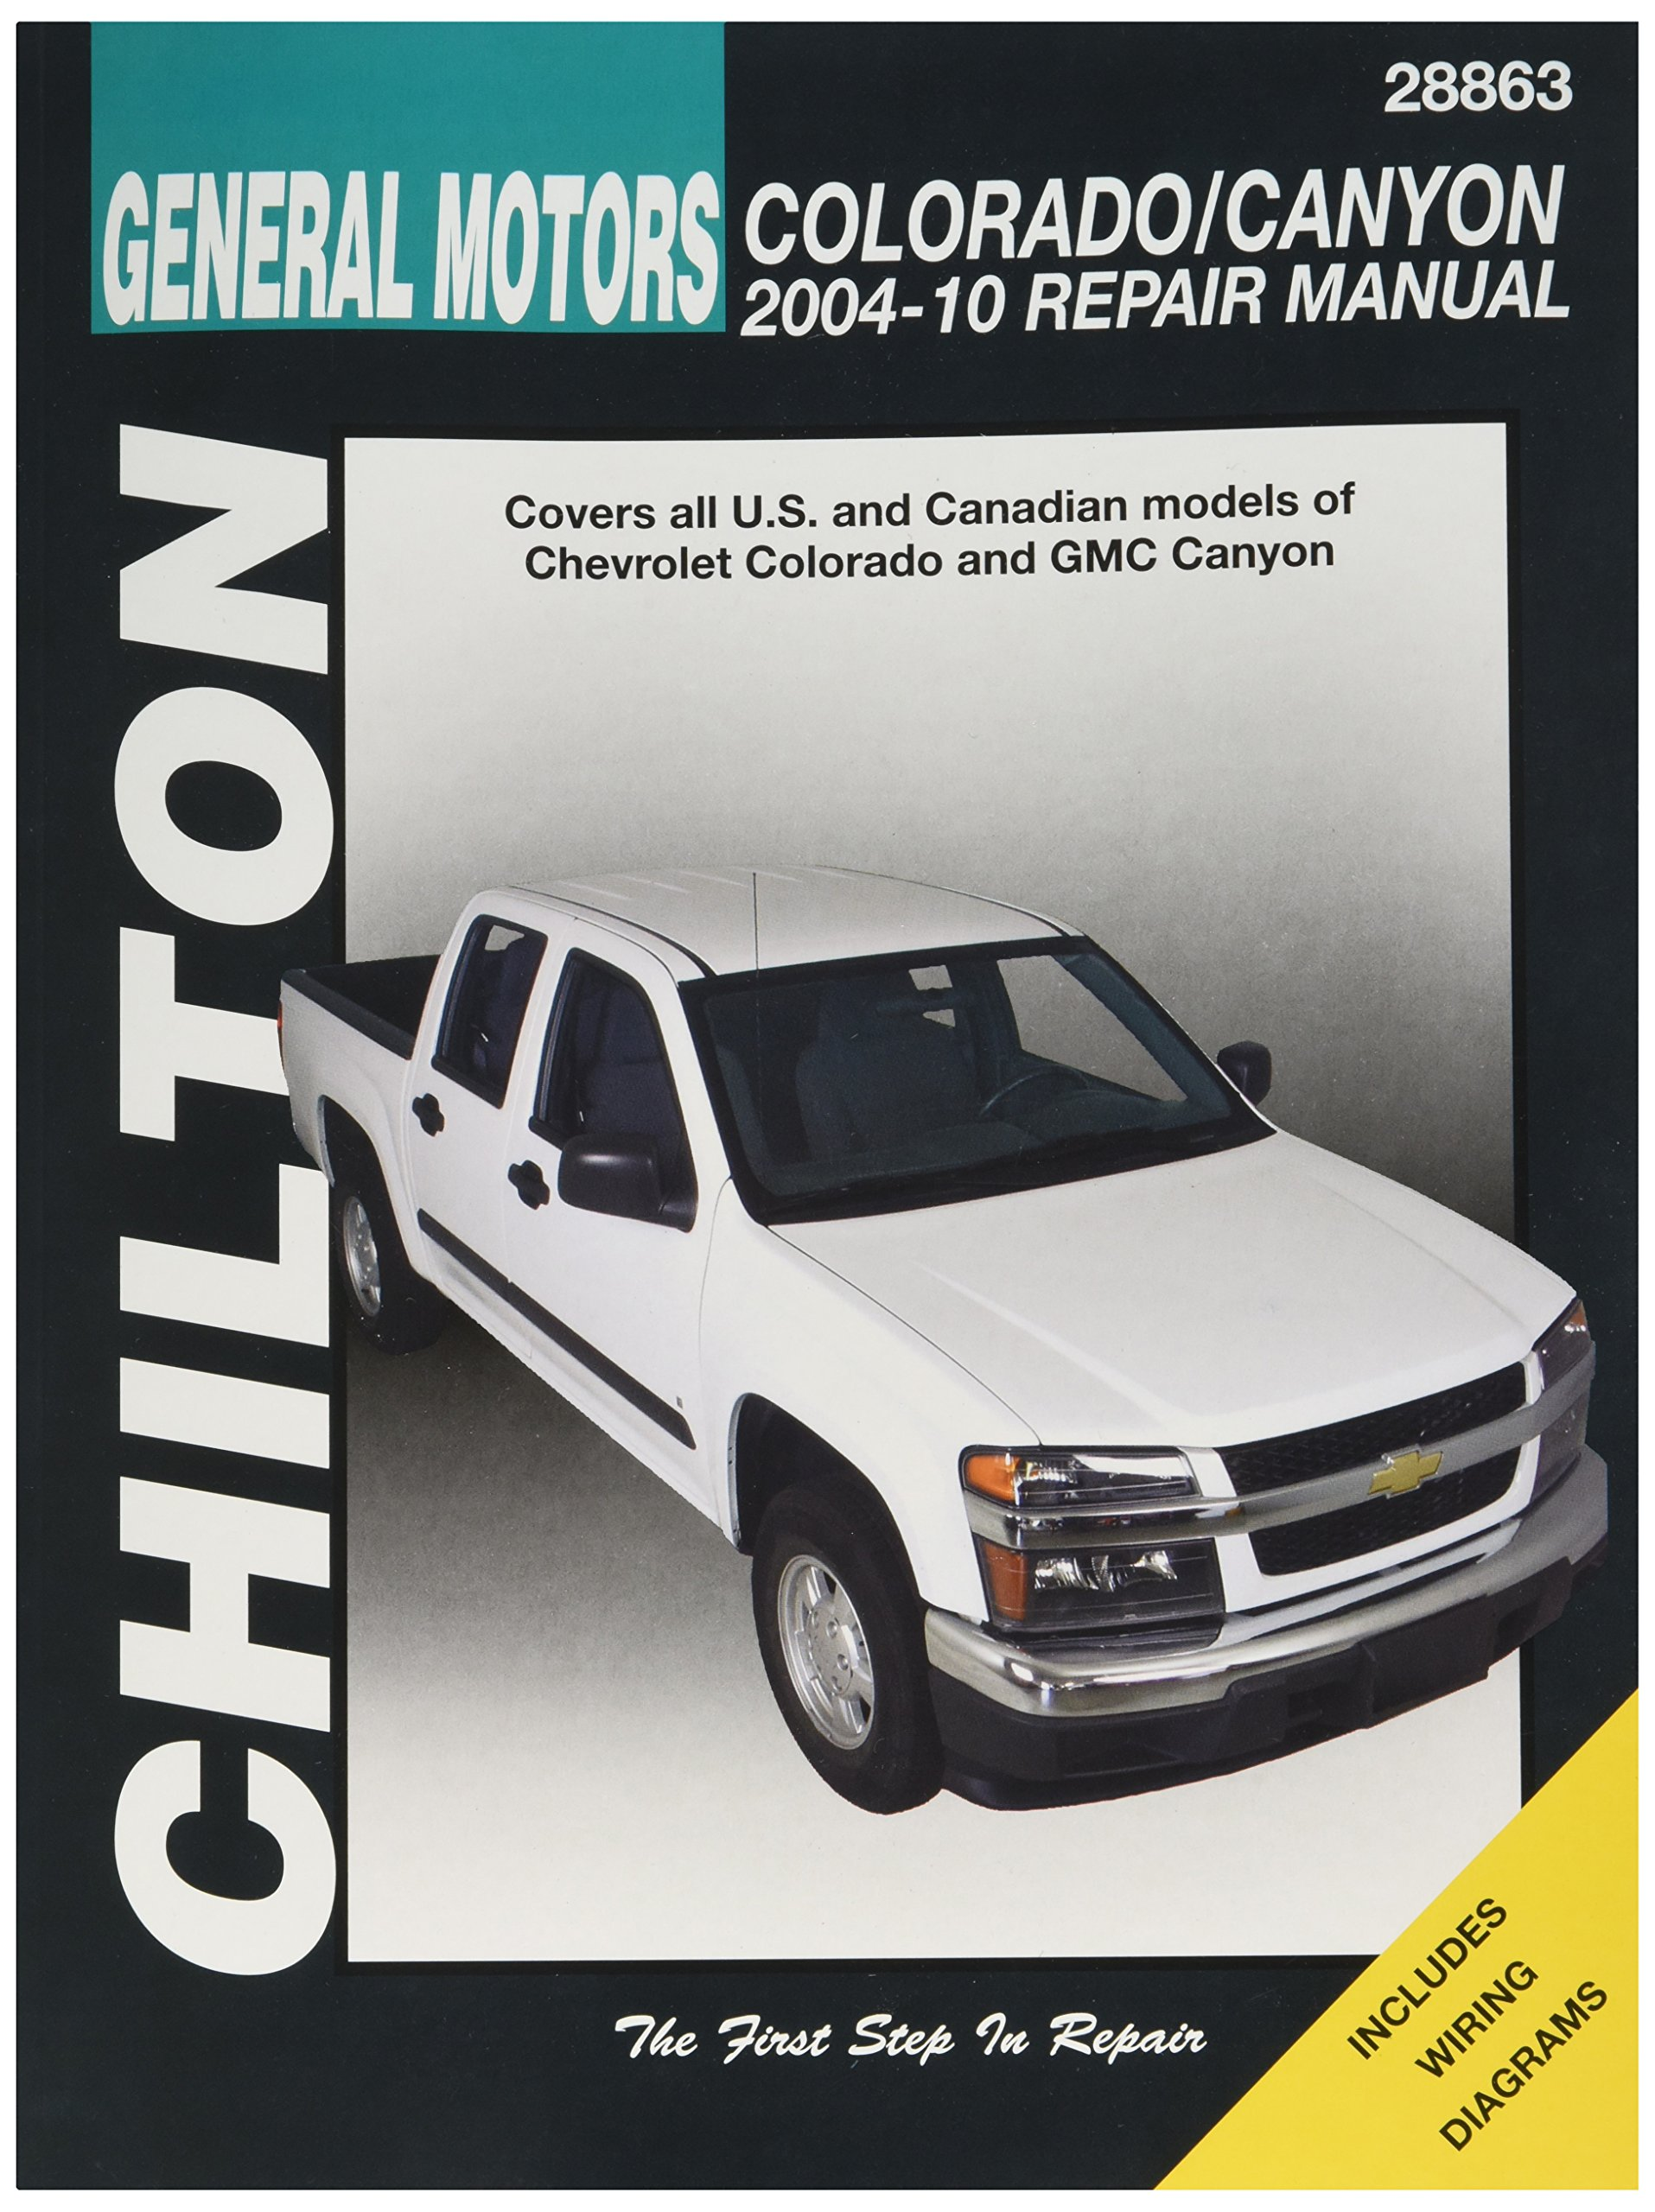 2004 gmc canyon manual